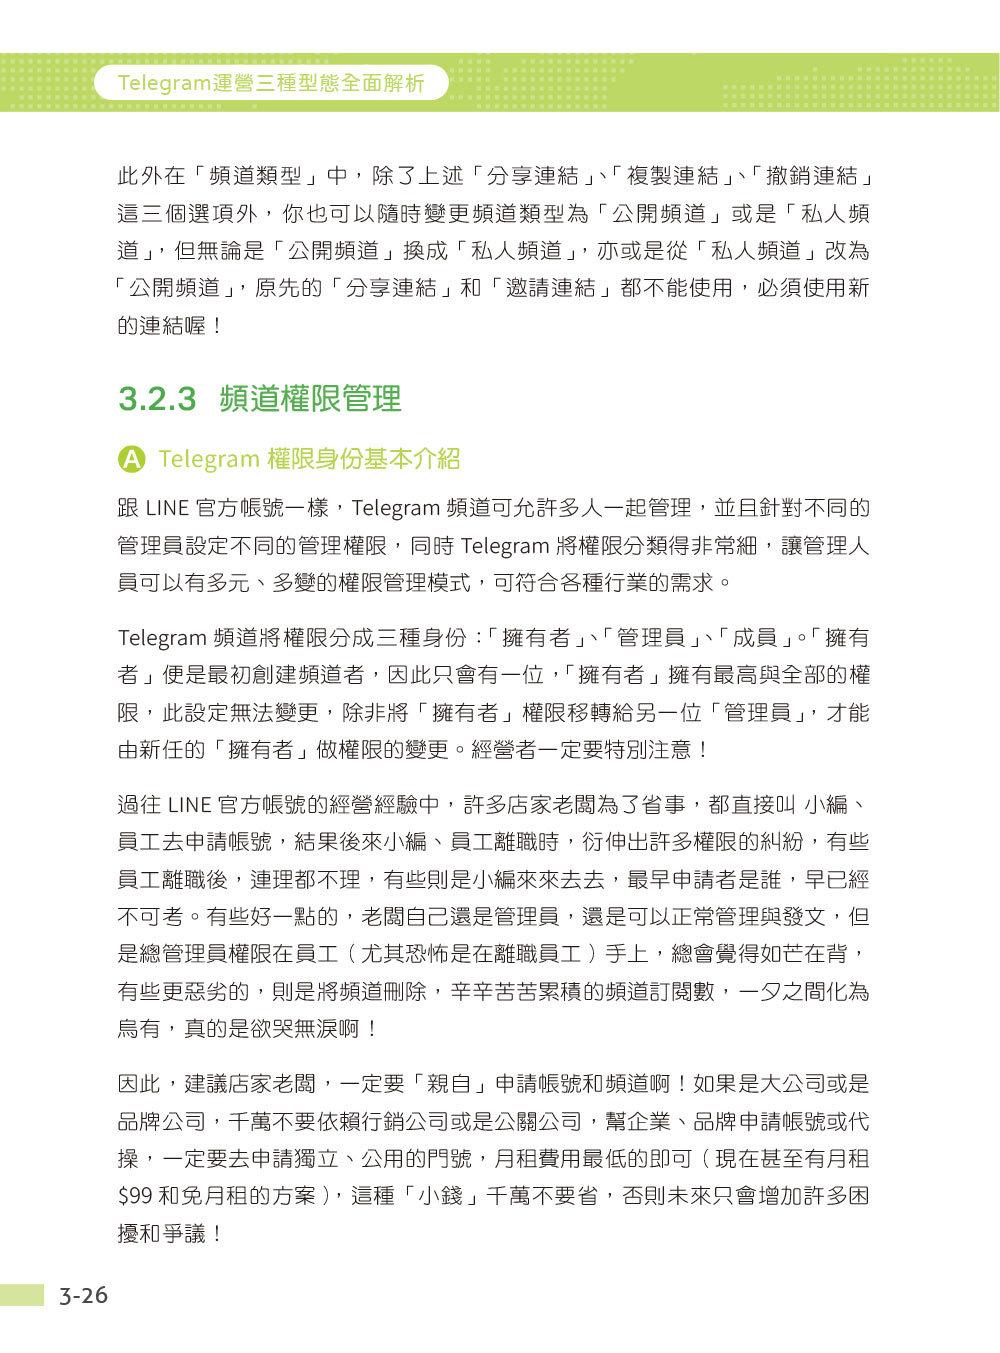 Telegram 行動行銷|操作技巧x品牌貼圖x經營心法-preview-6